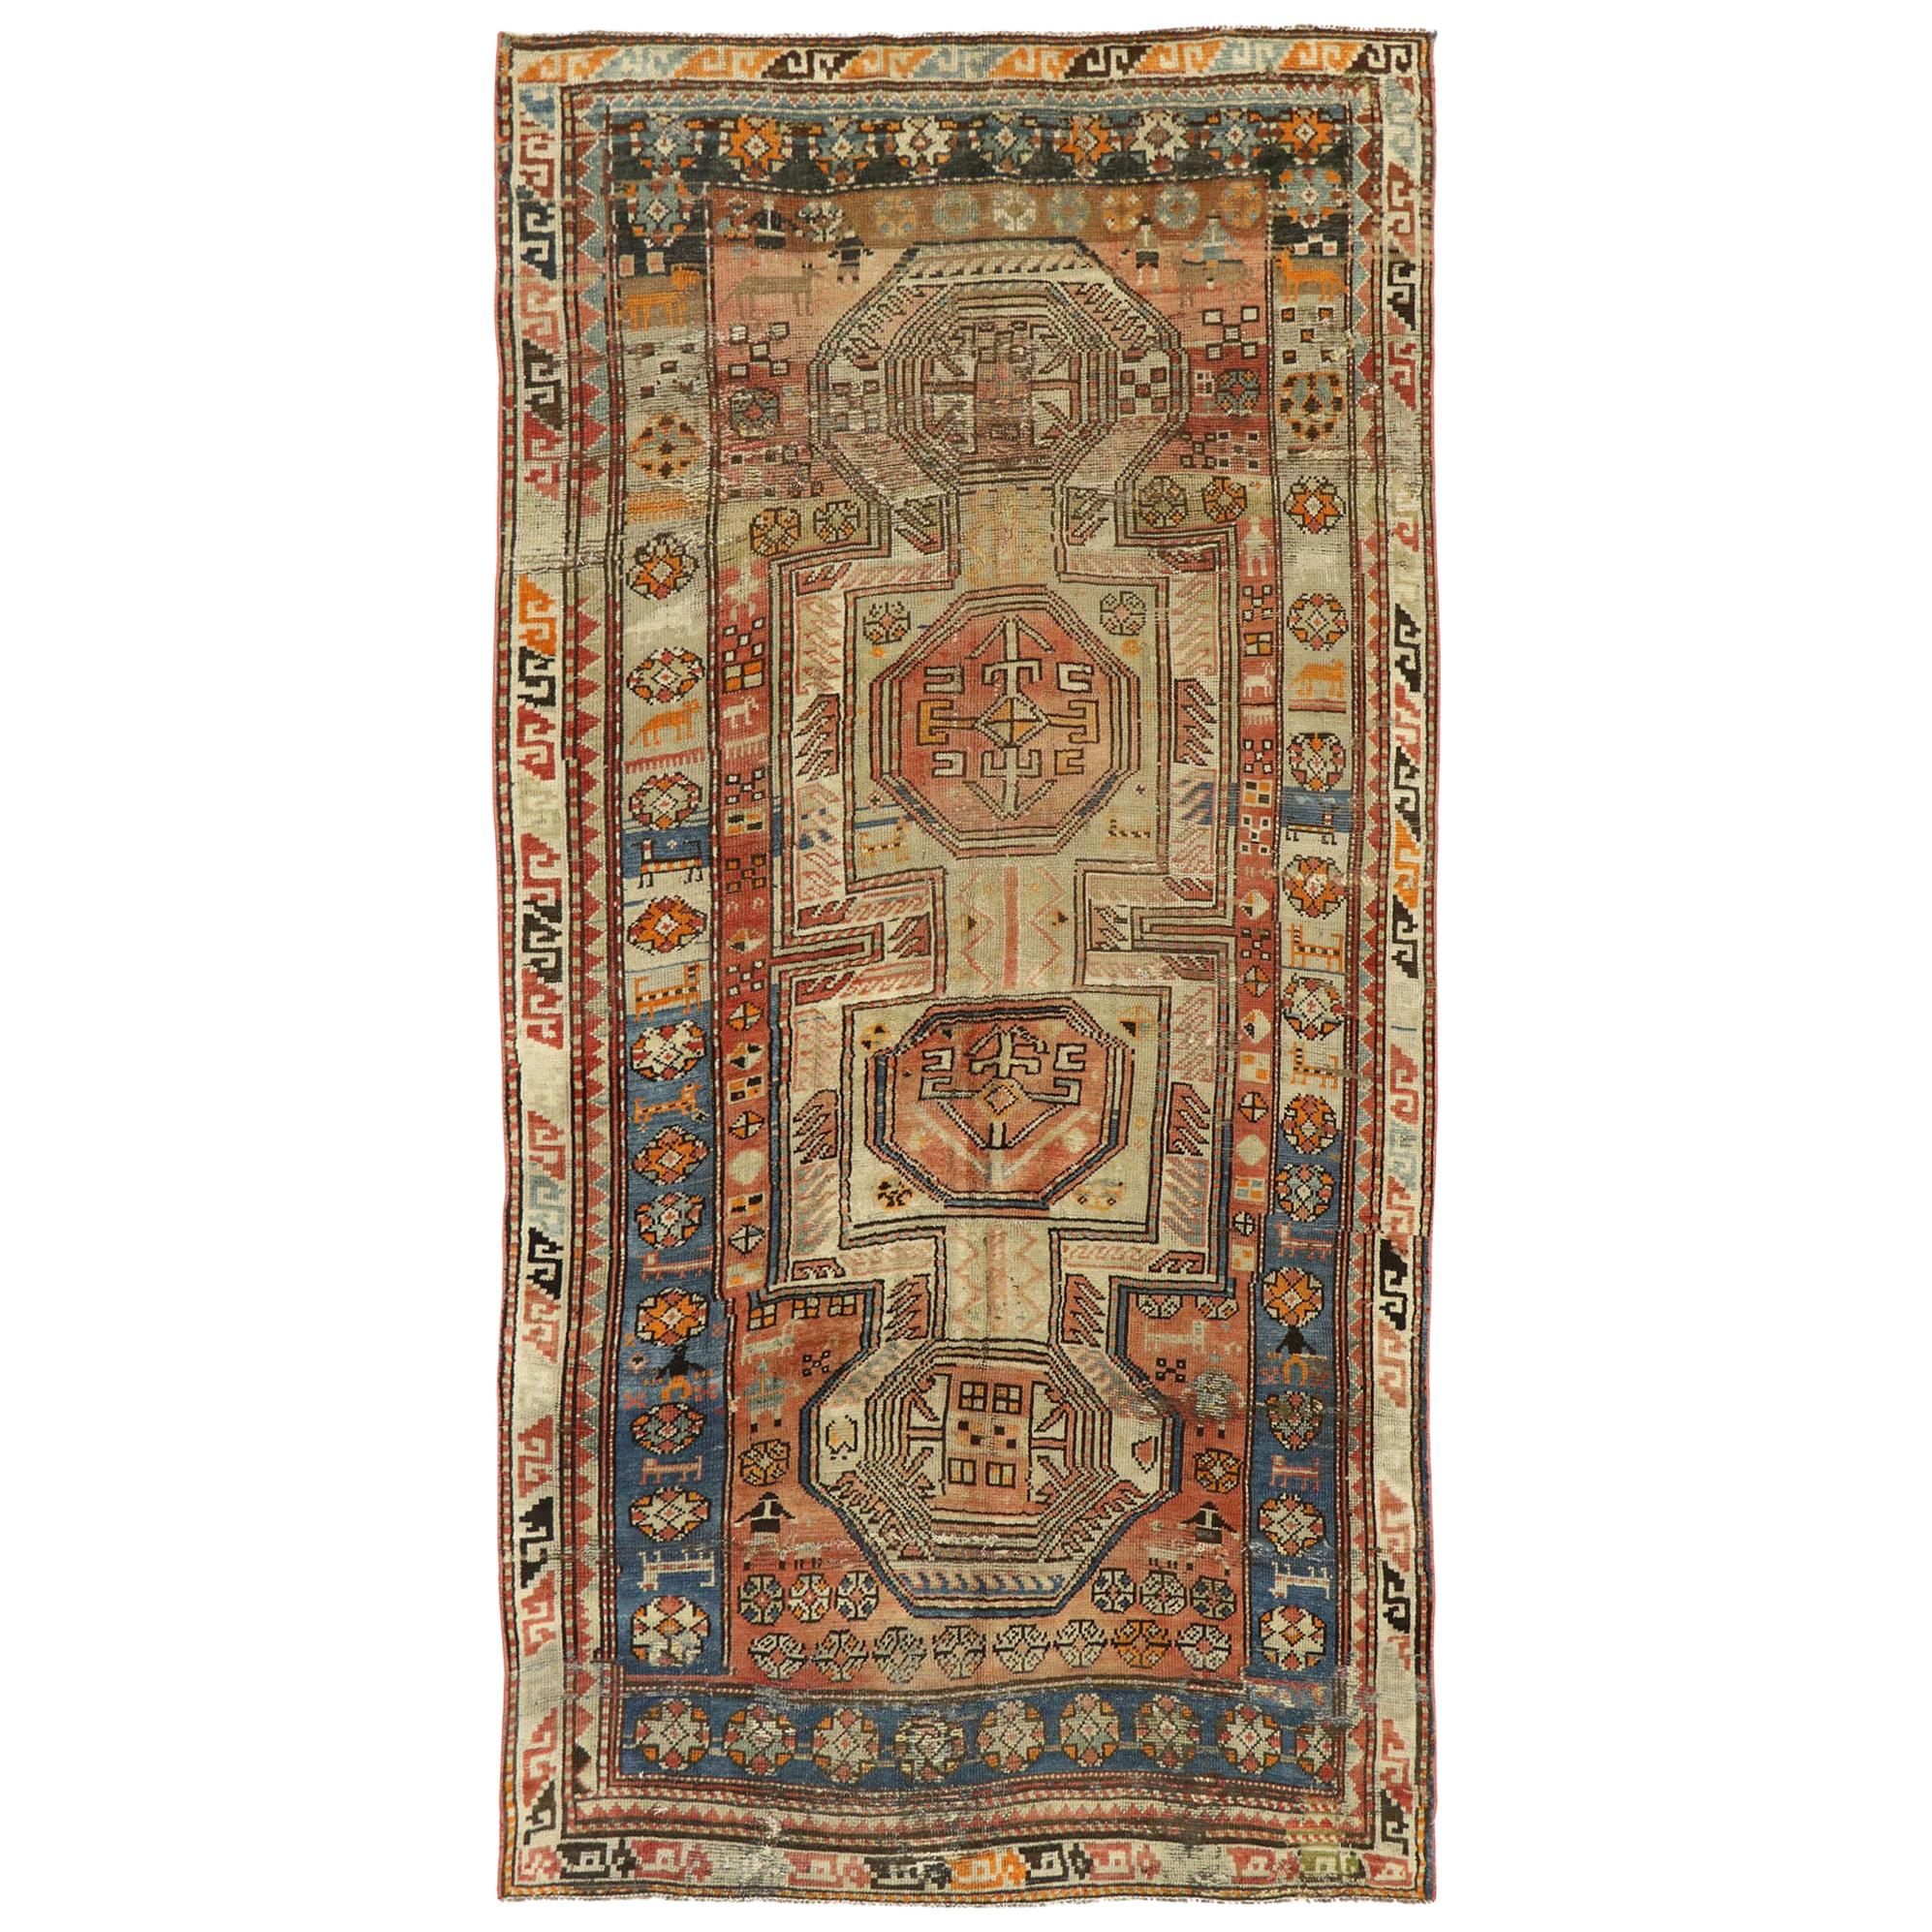 Distressed Antique Caucasian Kazak Tribal Rug, Wide Hallway Runner